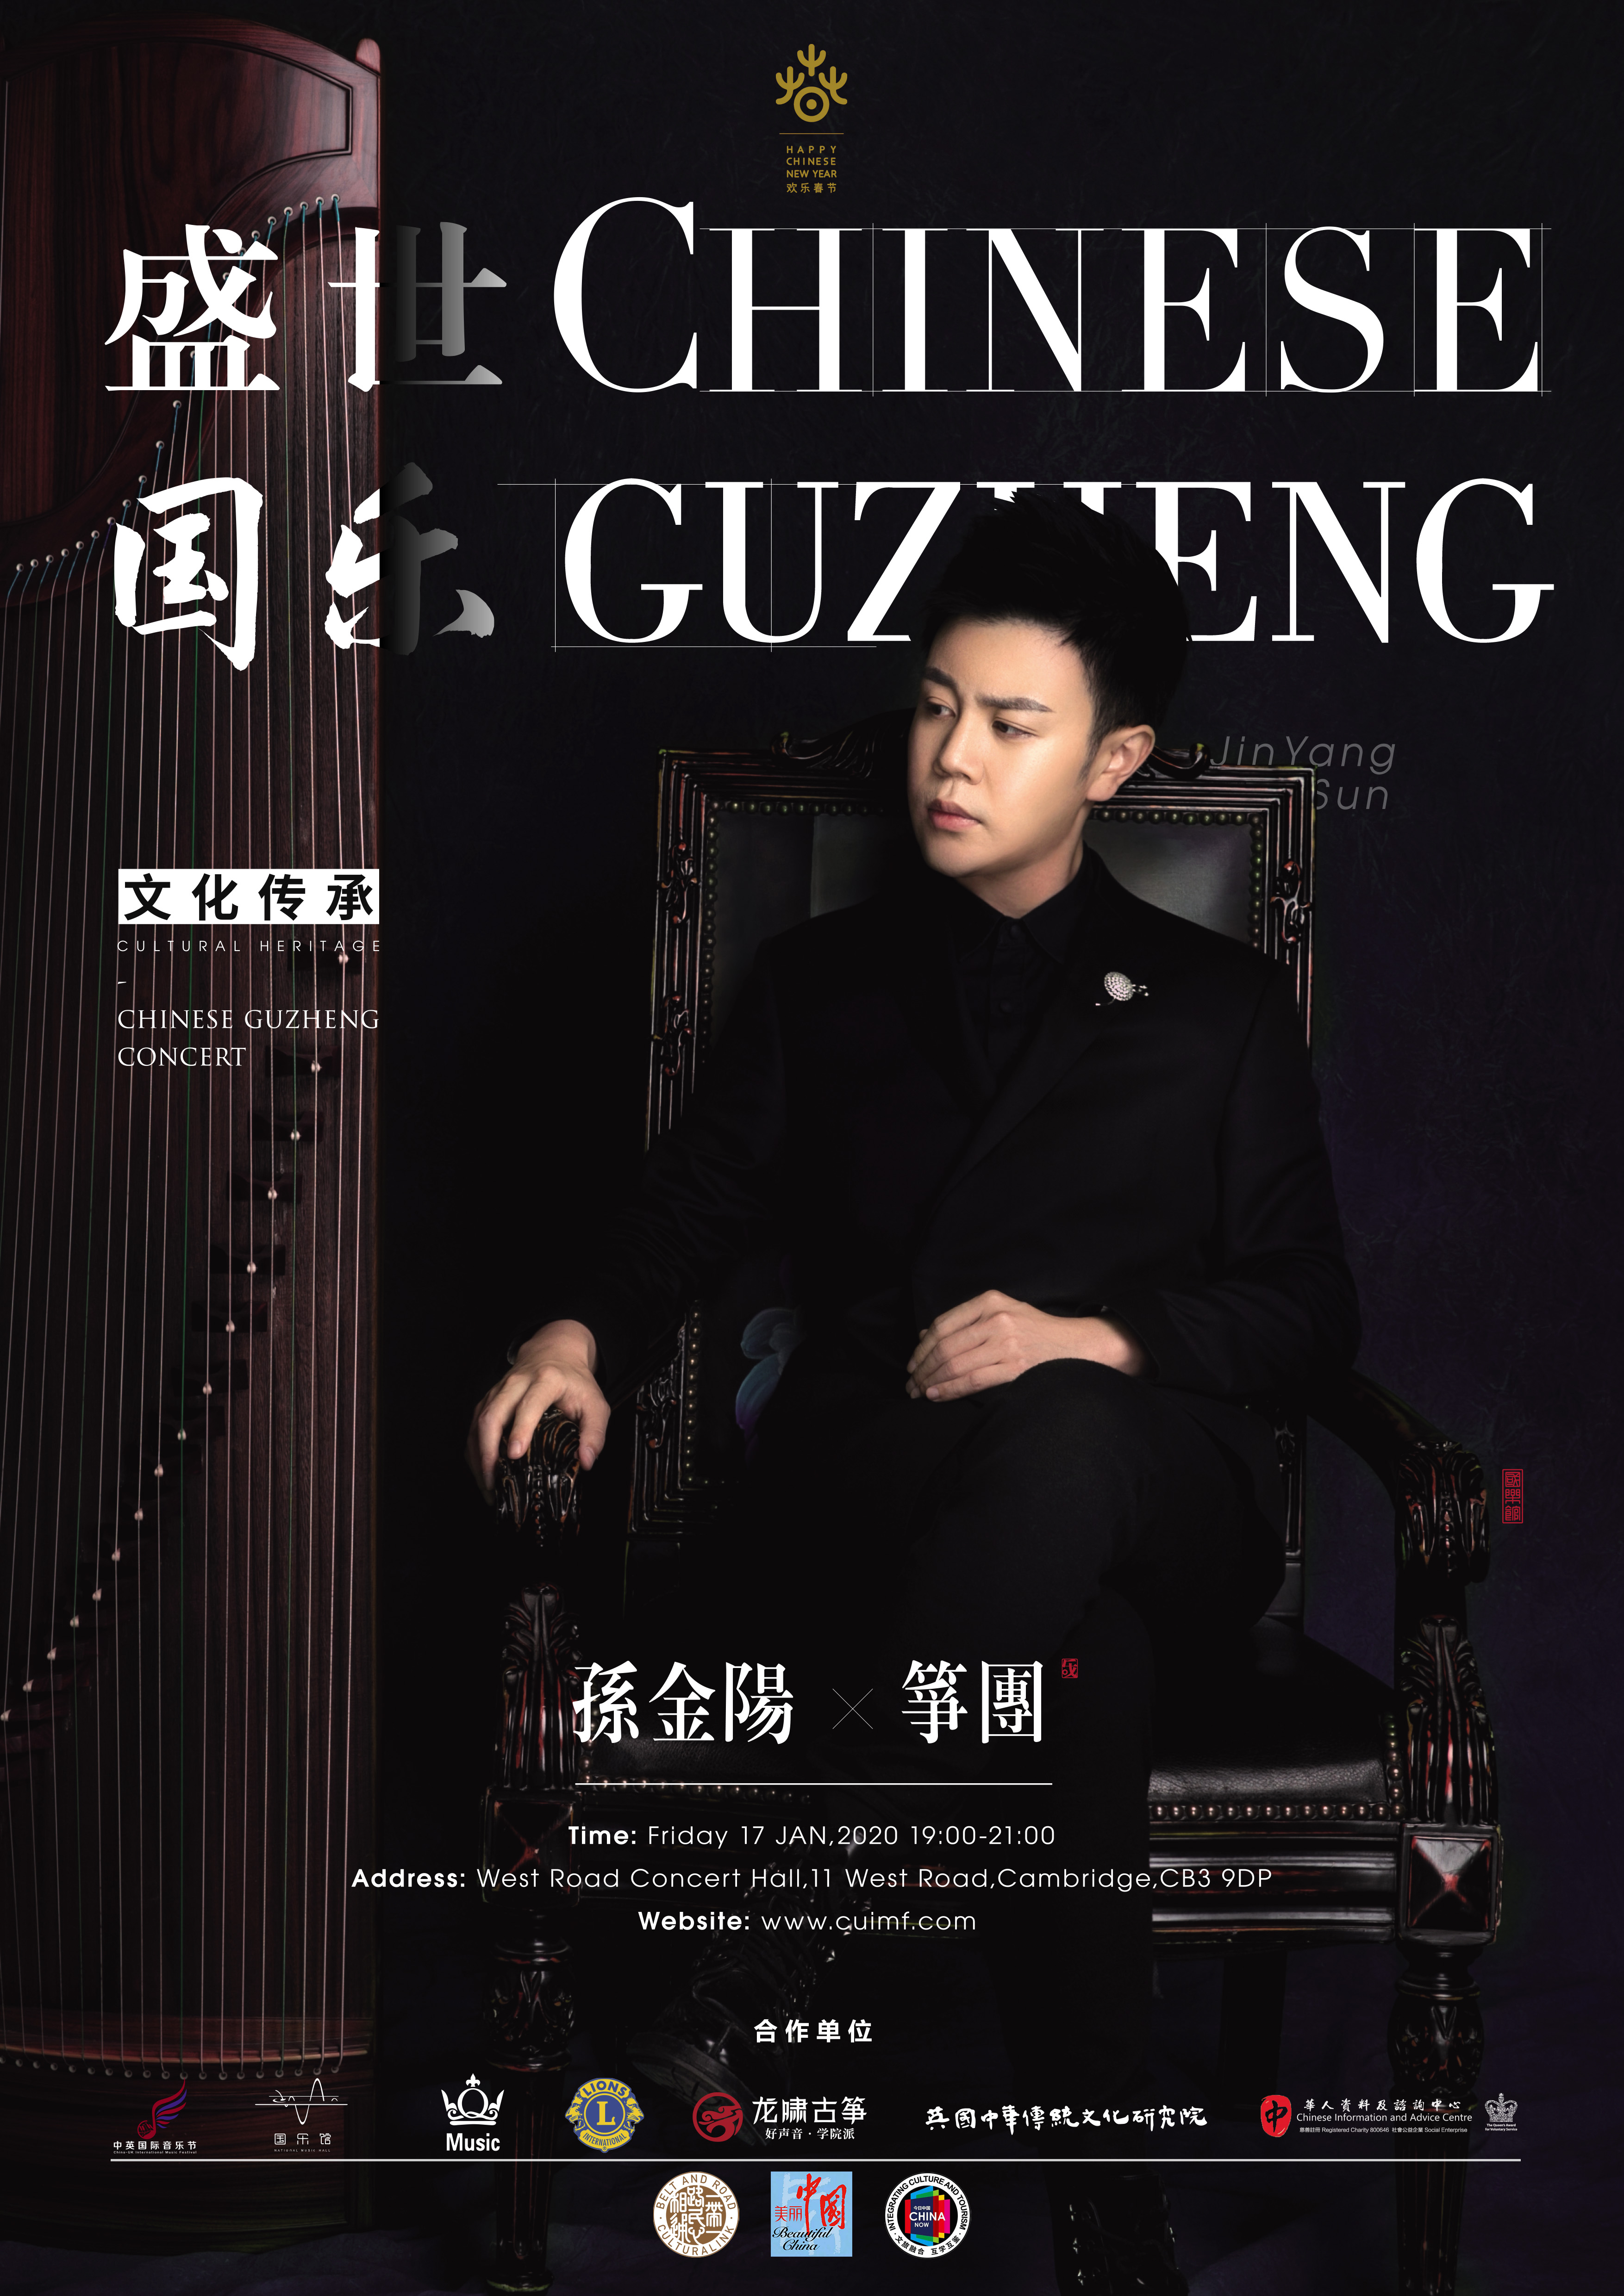 盛世国乐-Chinese Guzheng Concert